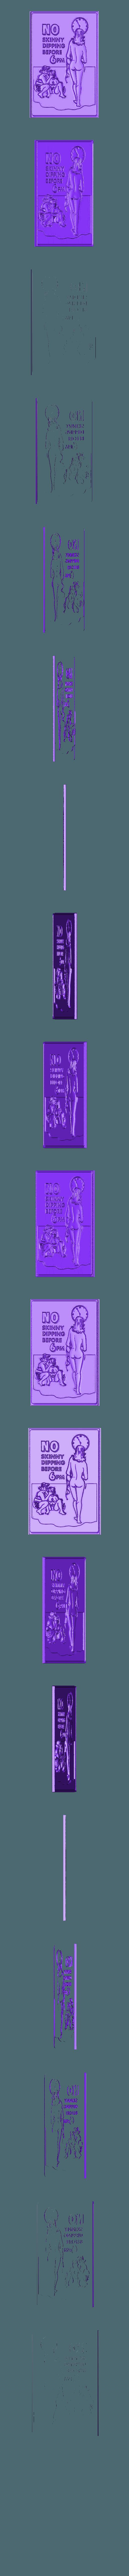 Dip.stl Download free STL file No Skinny Dipping • Model to 3D print, Account-Closed